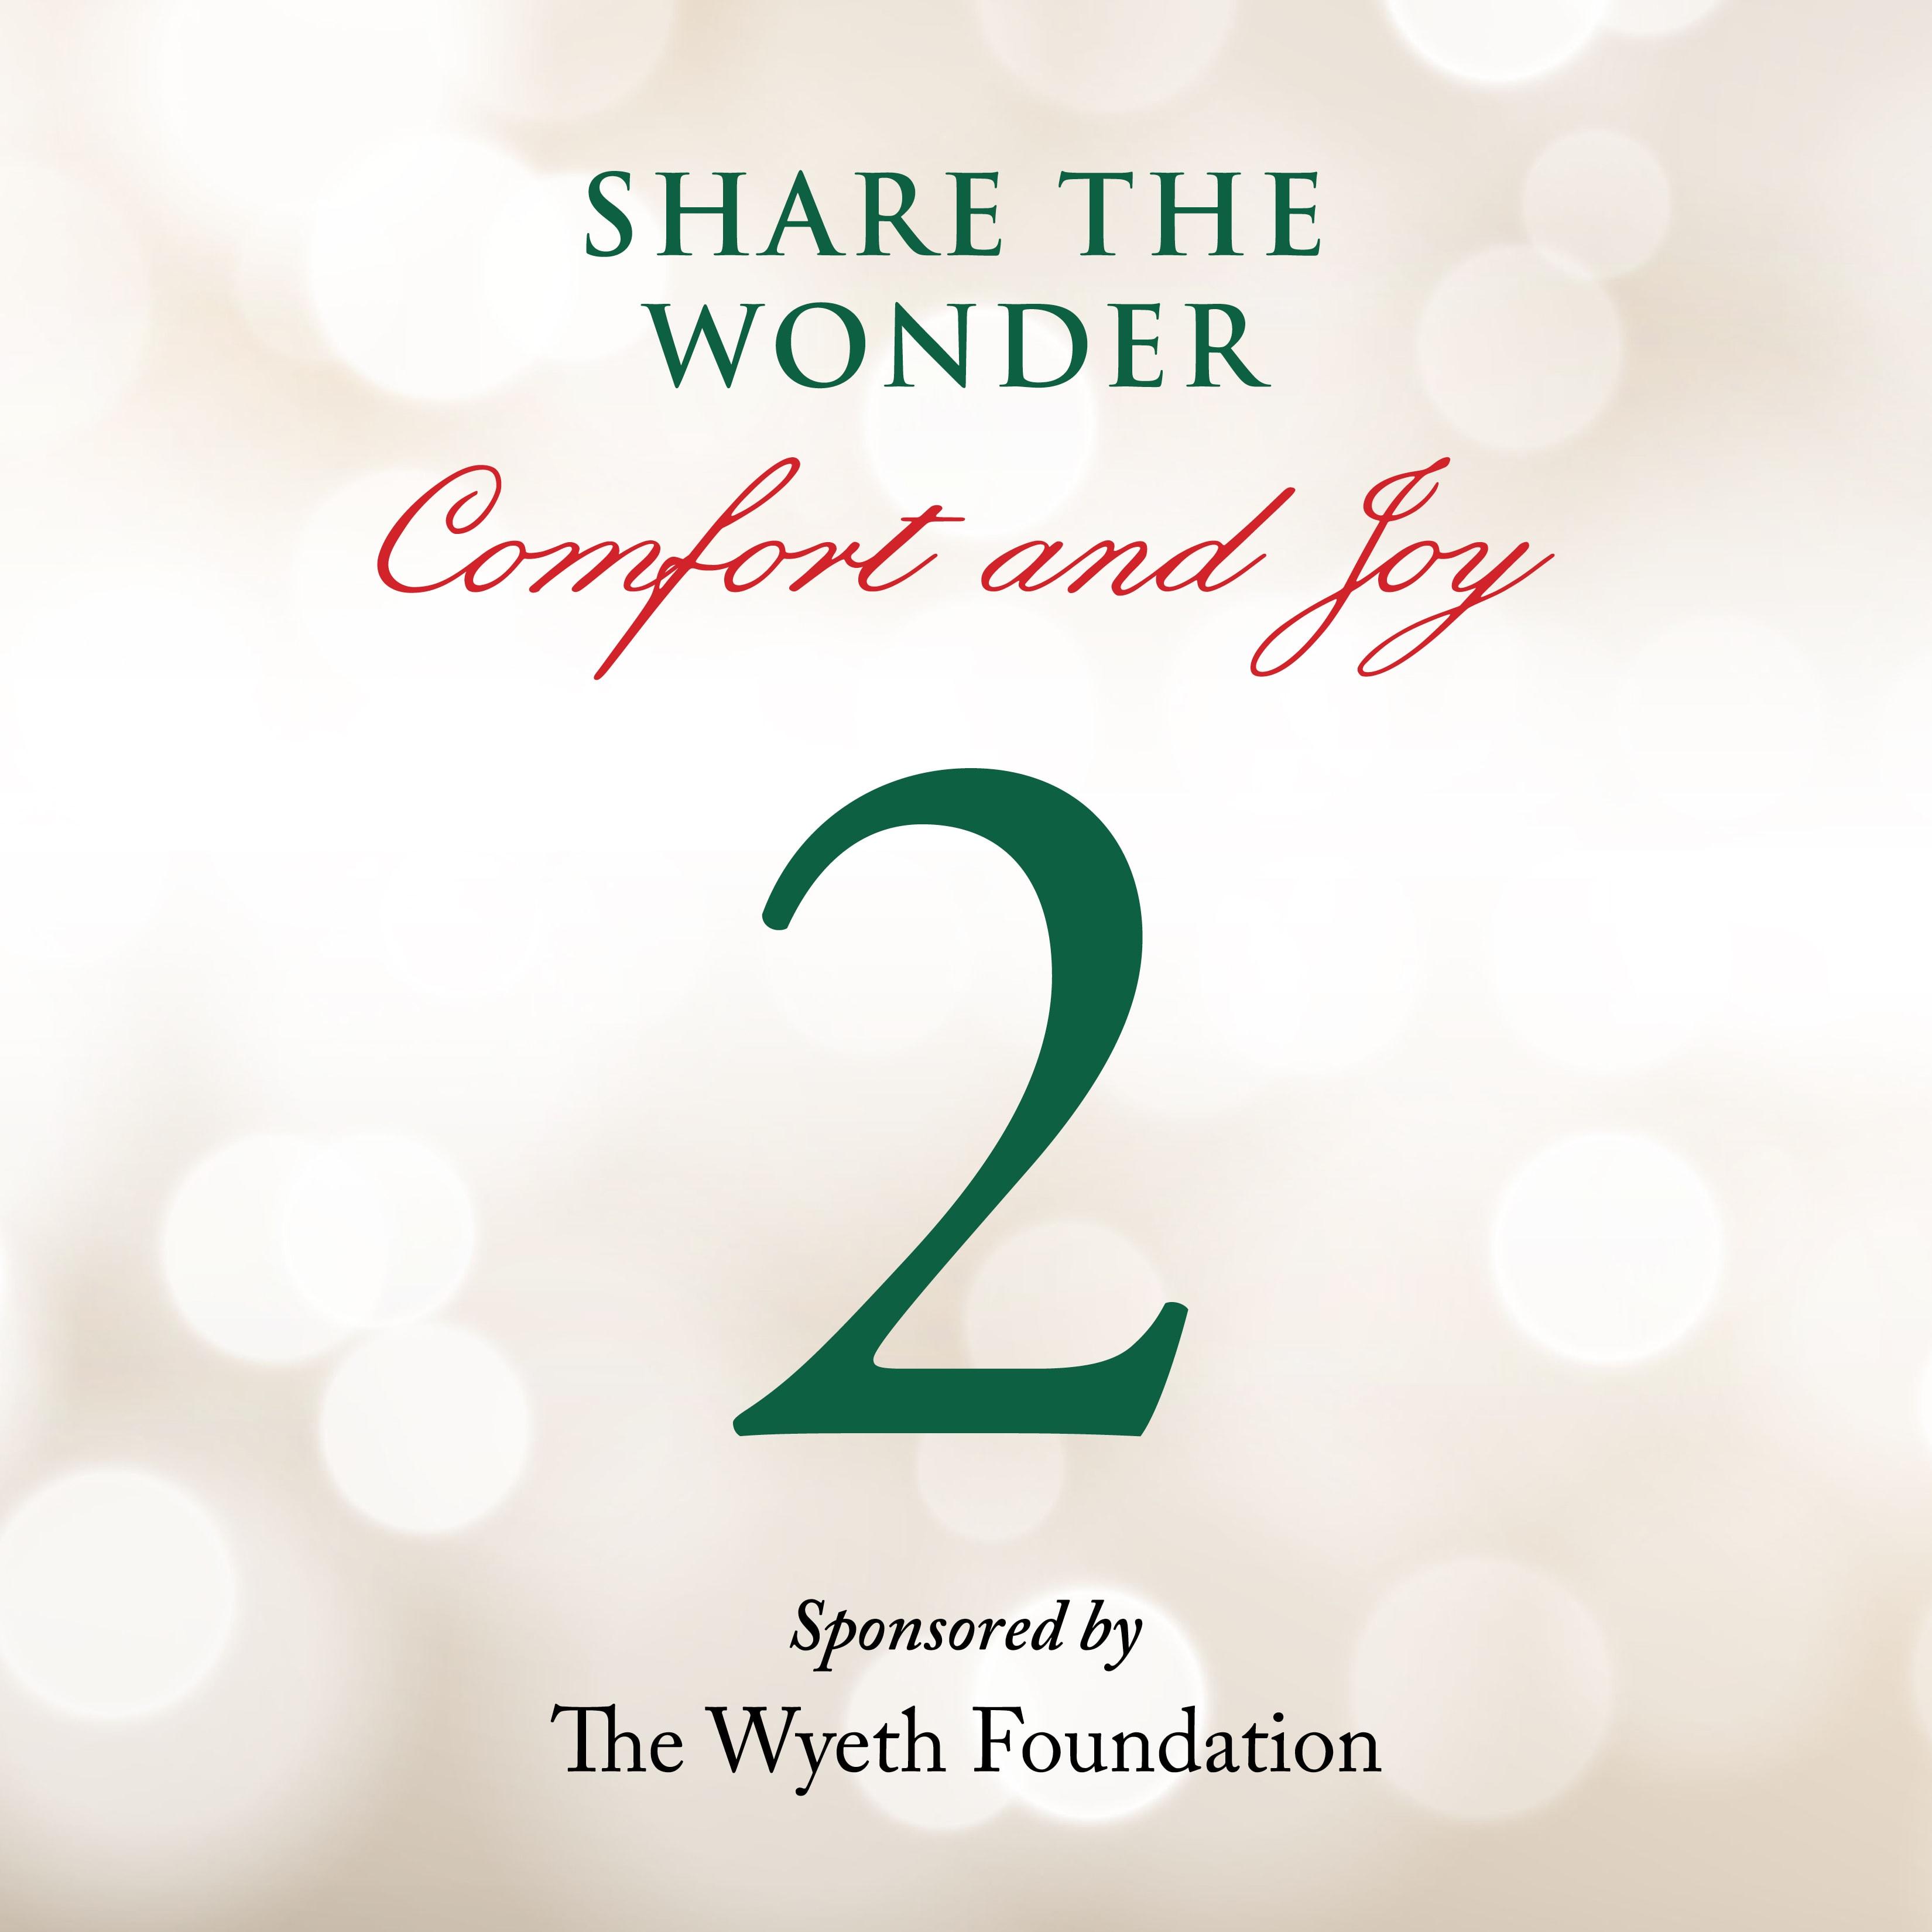 Day 2 of Share the Wonder: November 29